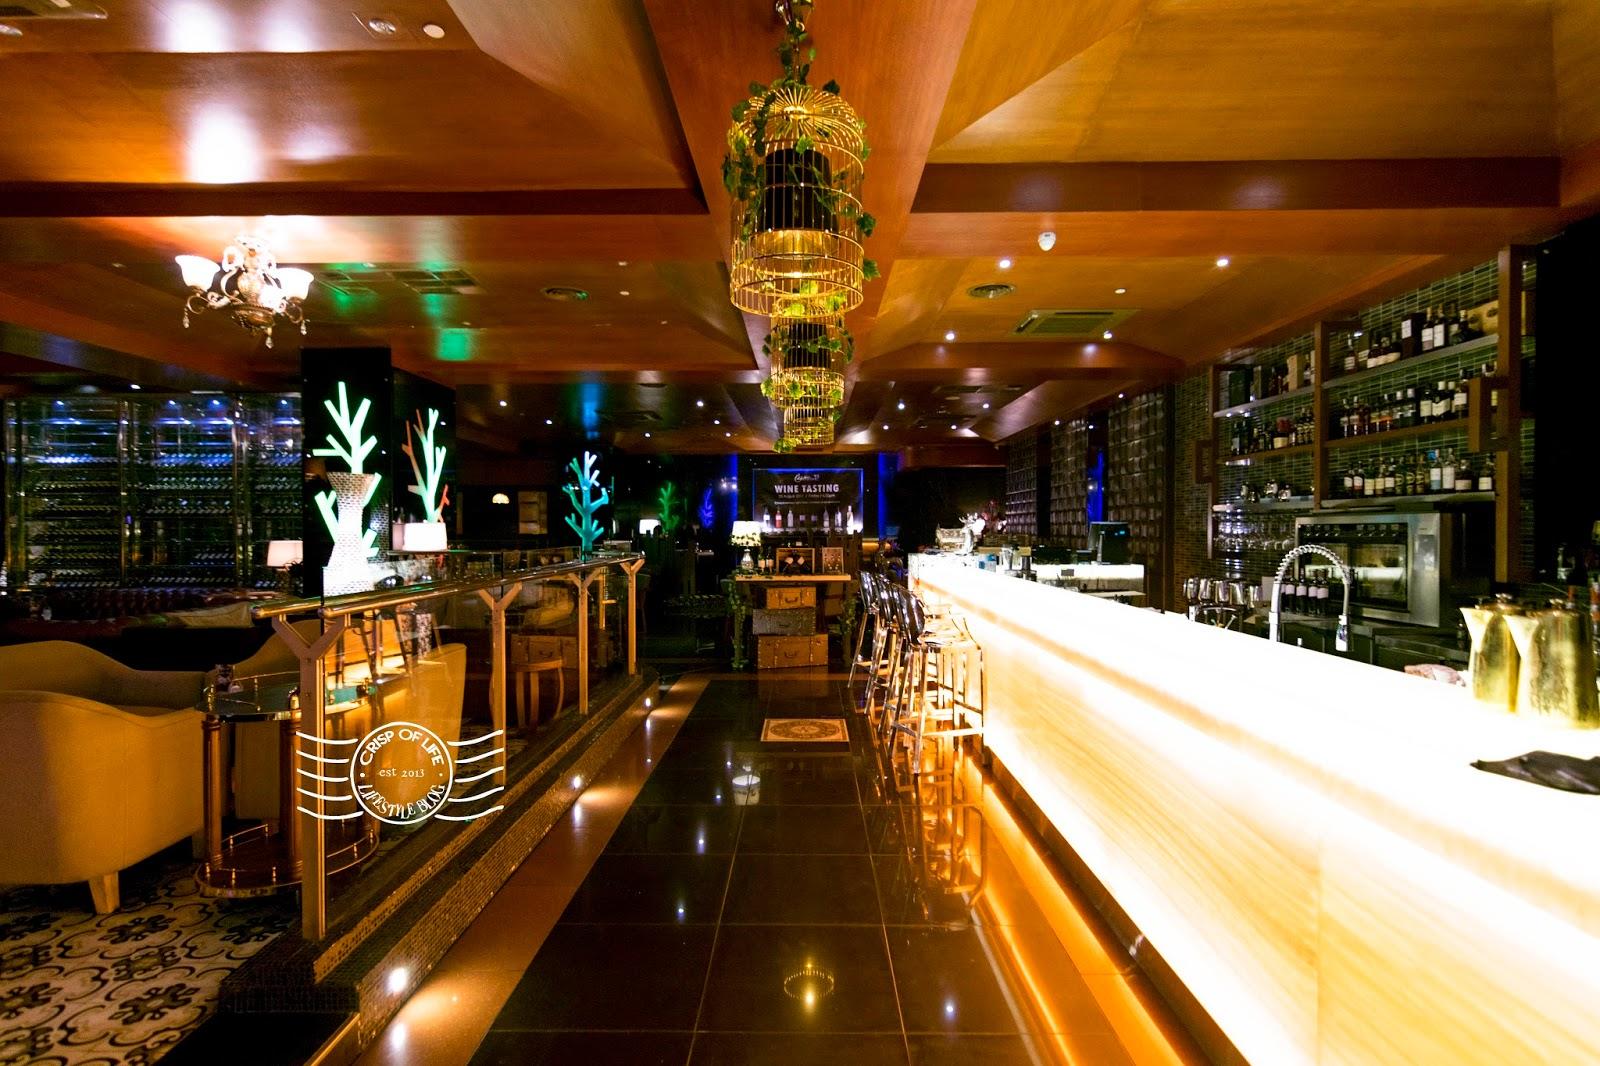 Chateau 33 High Tea Set @ Lot 33, Prangin Mall, Georgetown, Penang